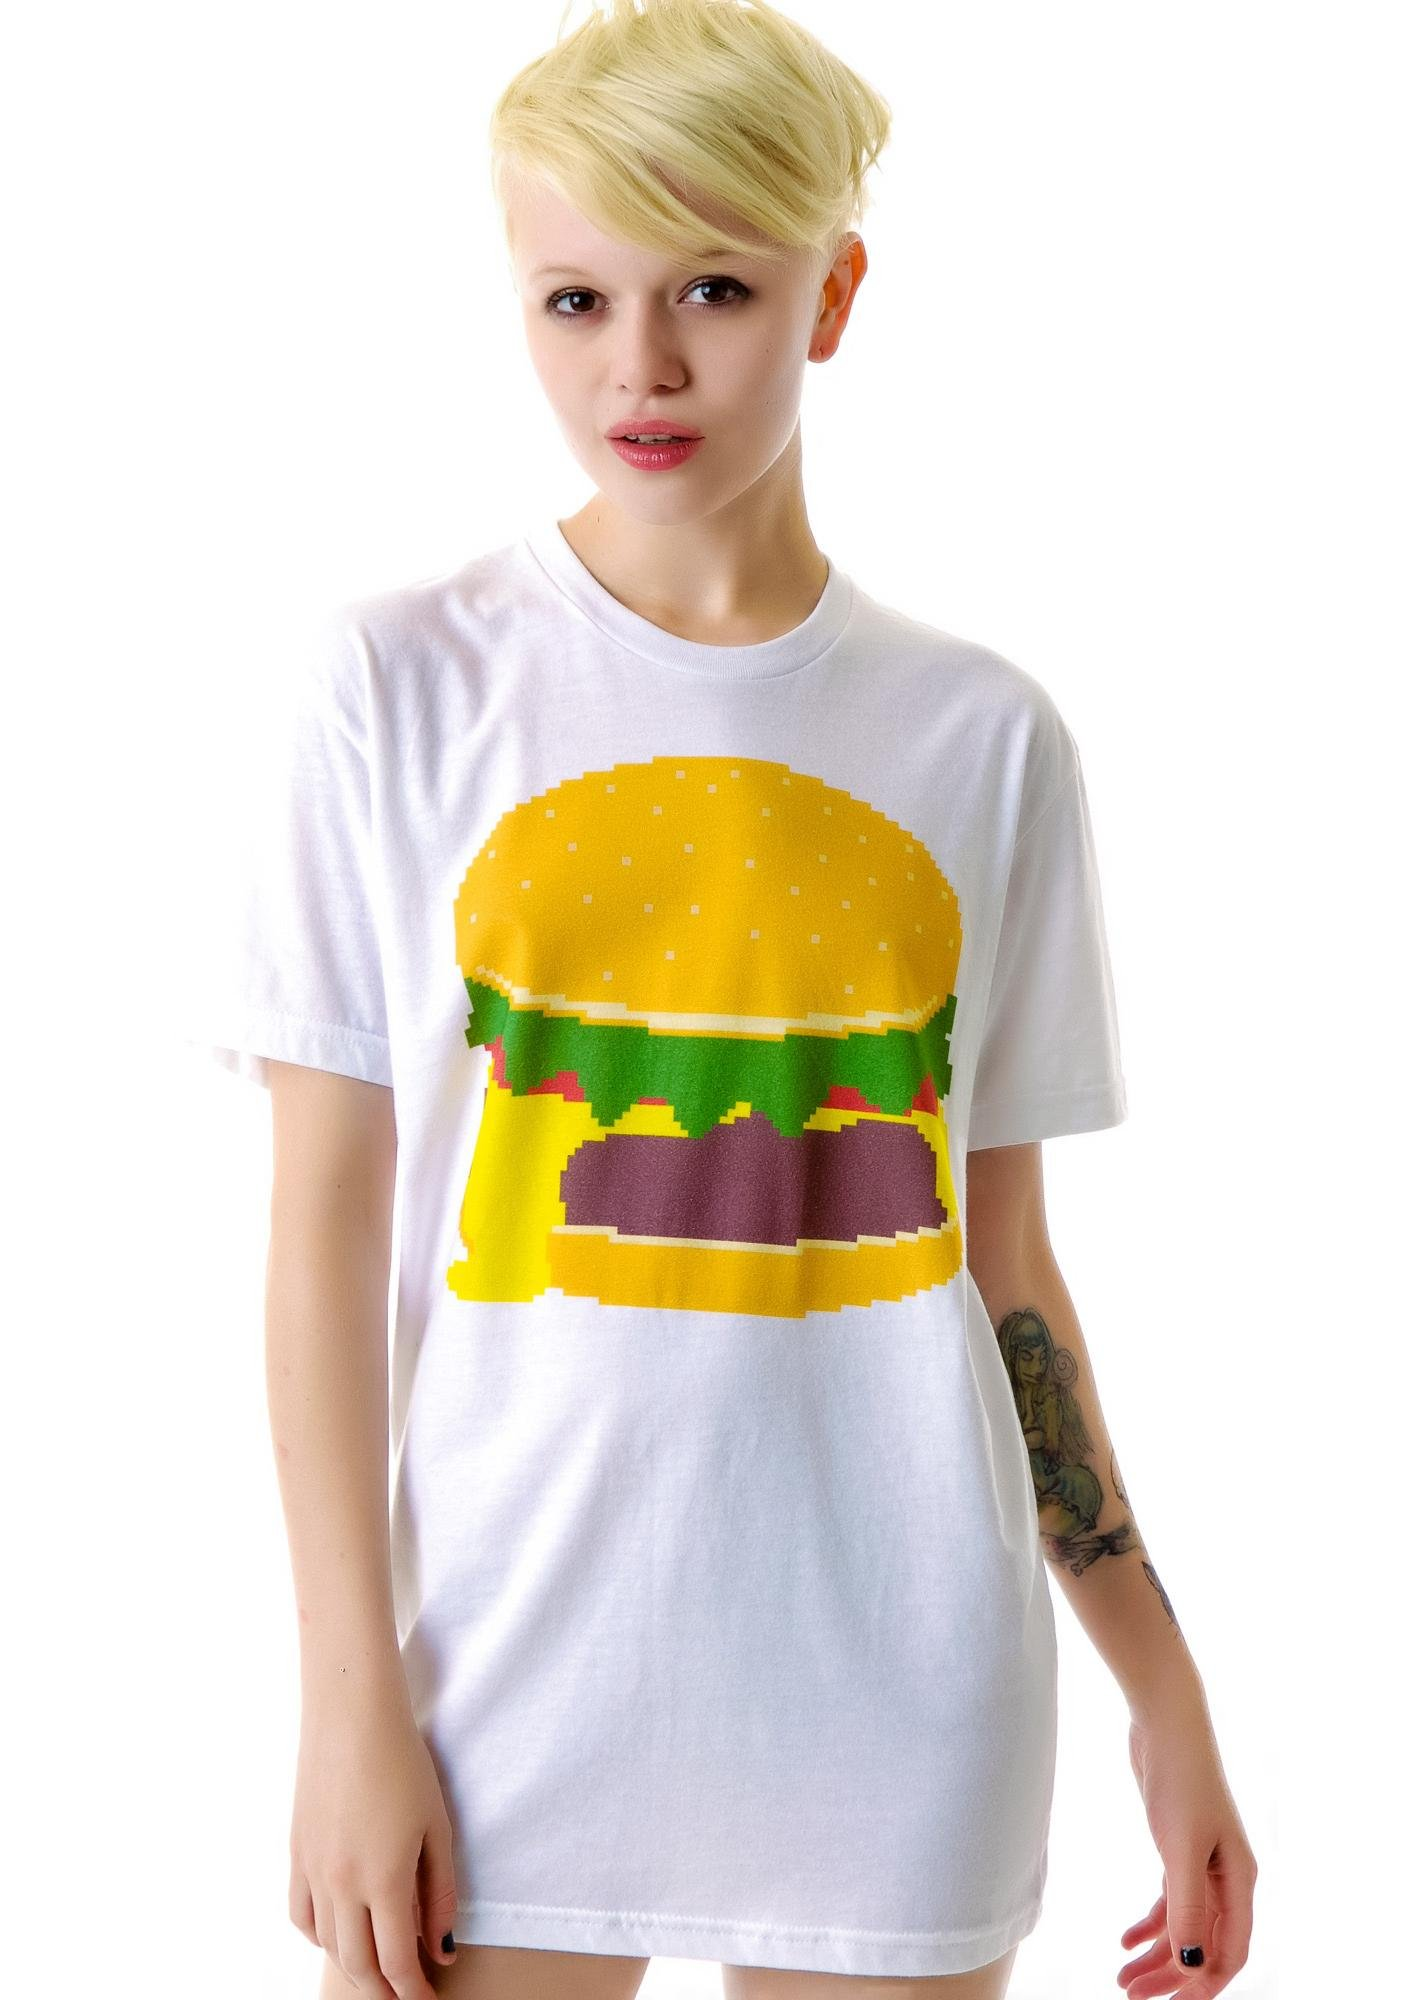 Cheeseburger BF Tee